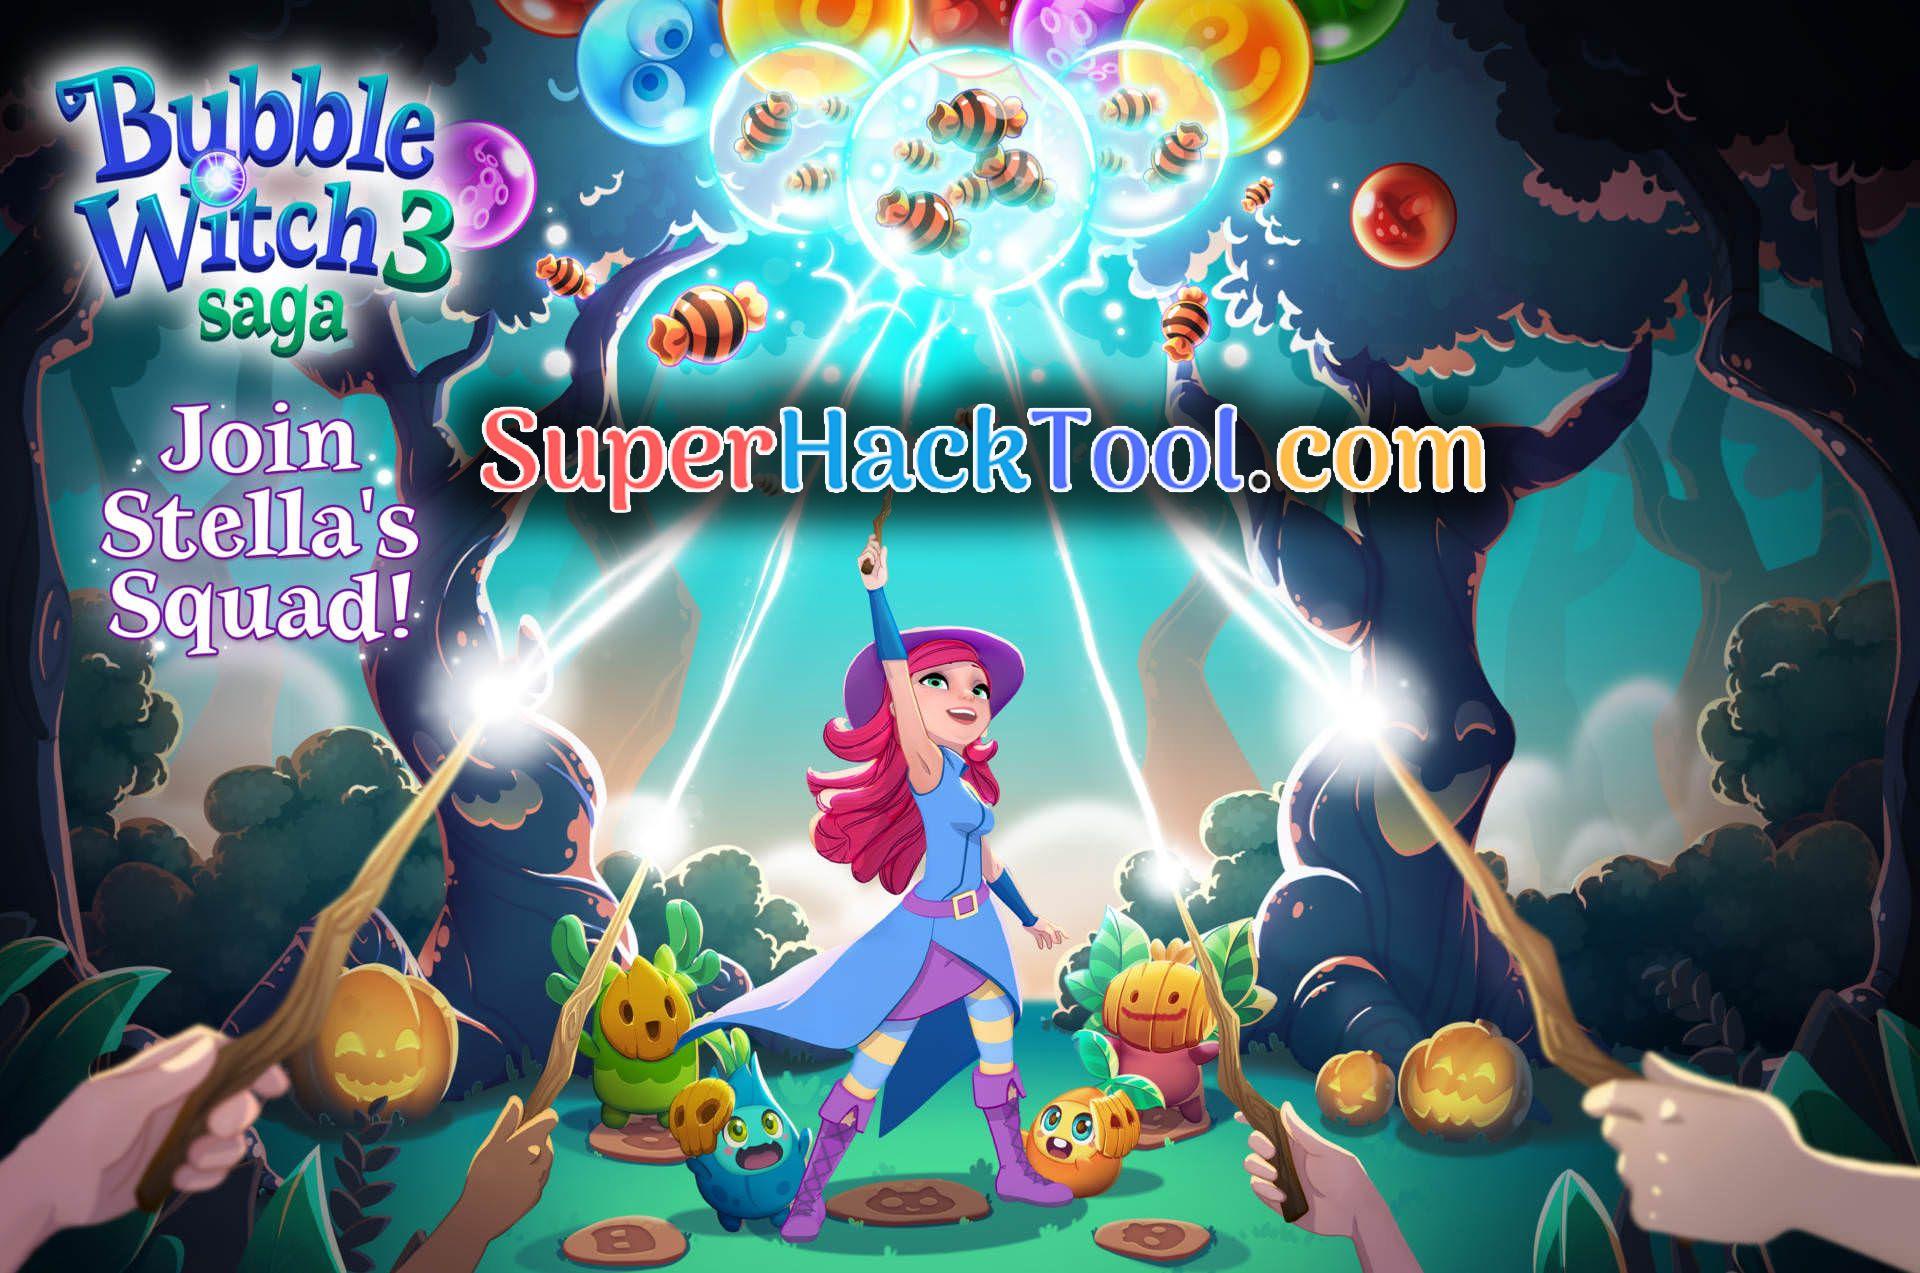 [No Survey] Bubble Witch 3 Saga Hack Get Free Gold Bars